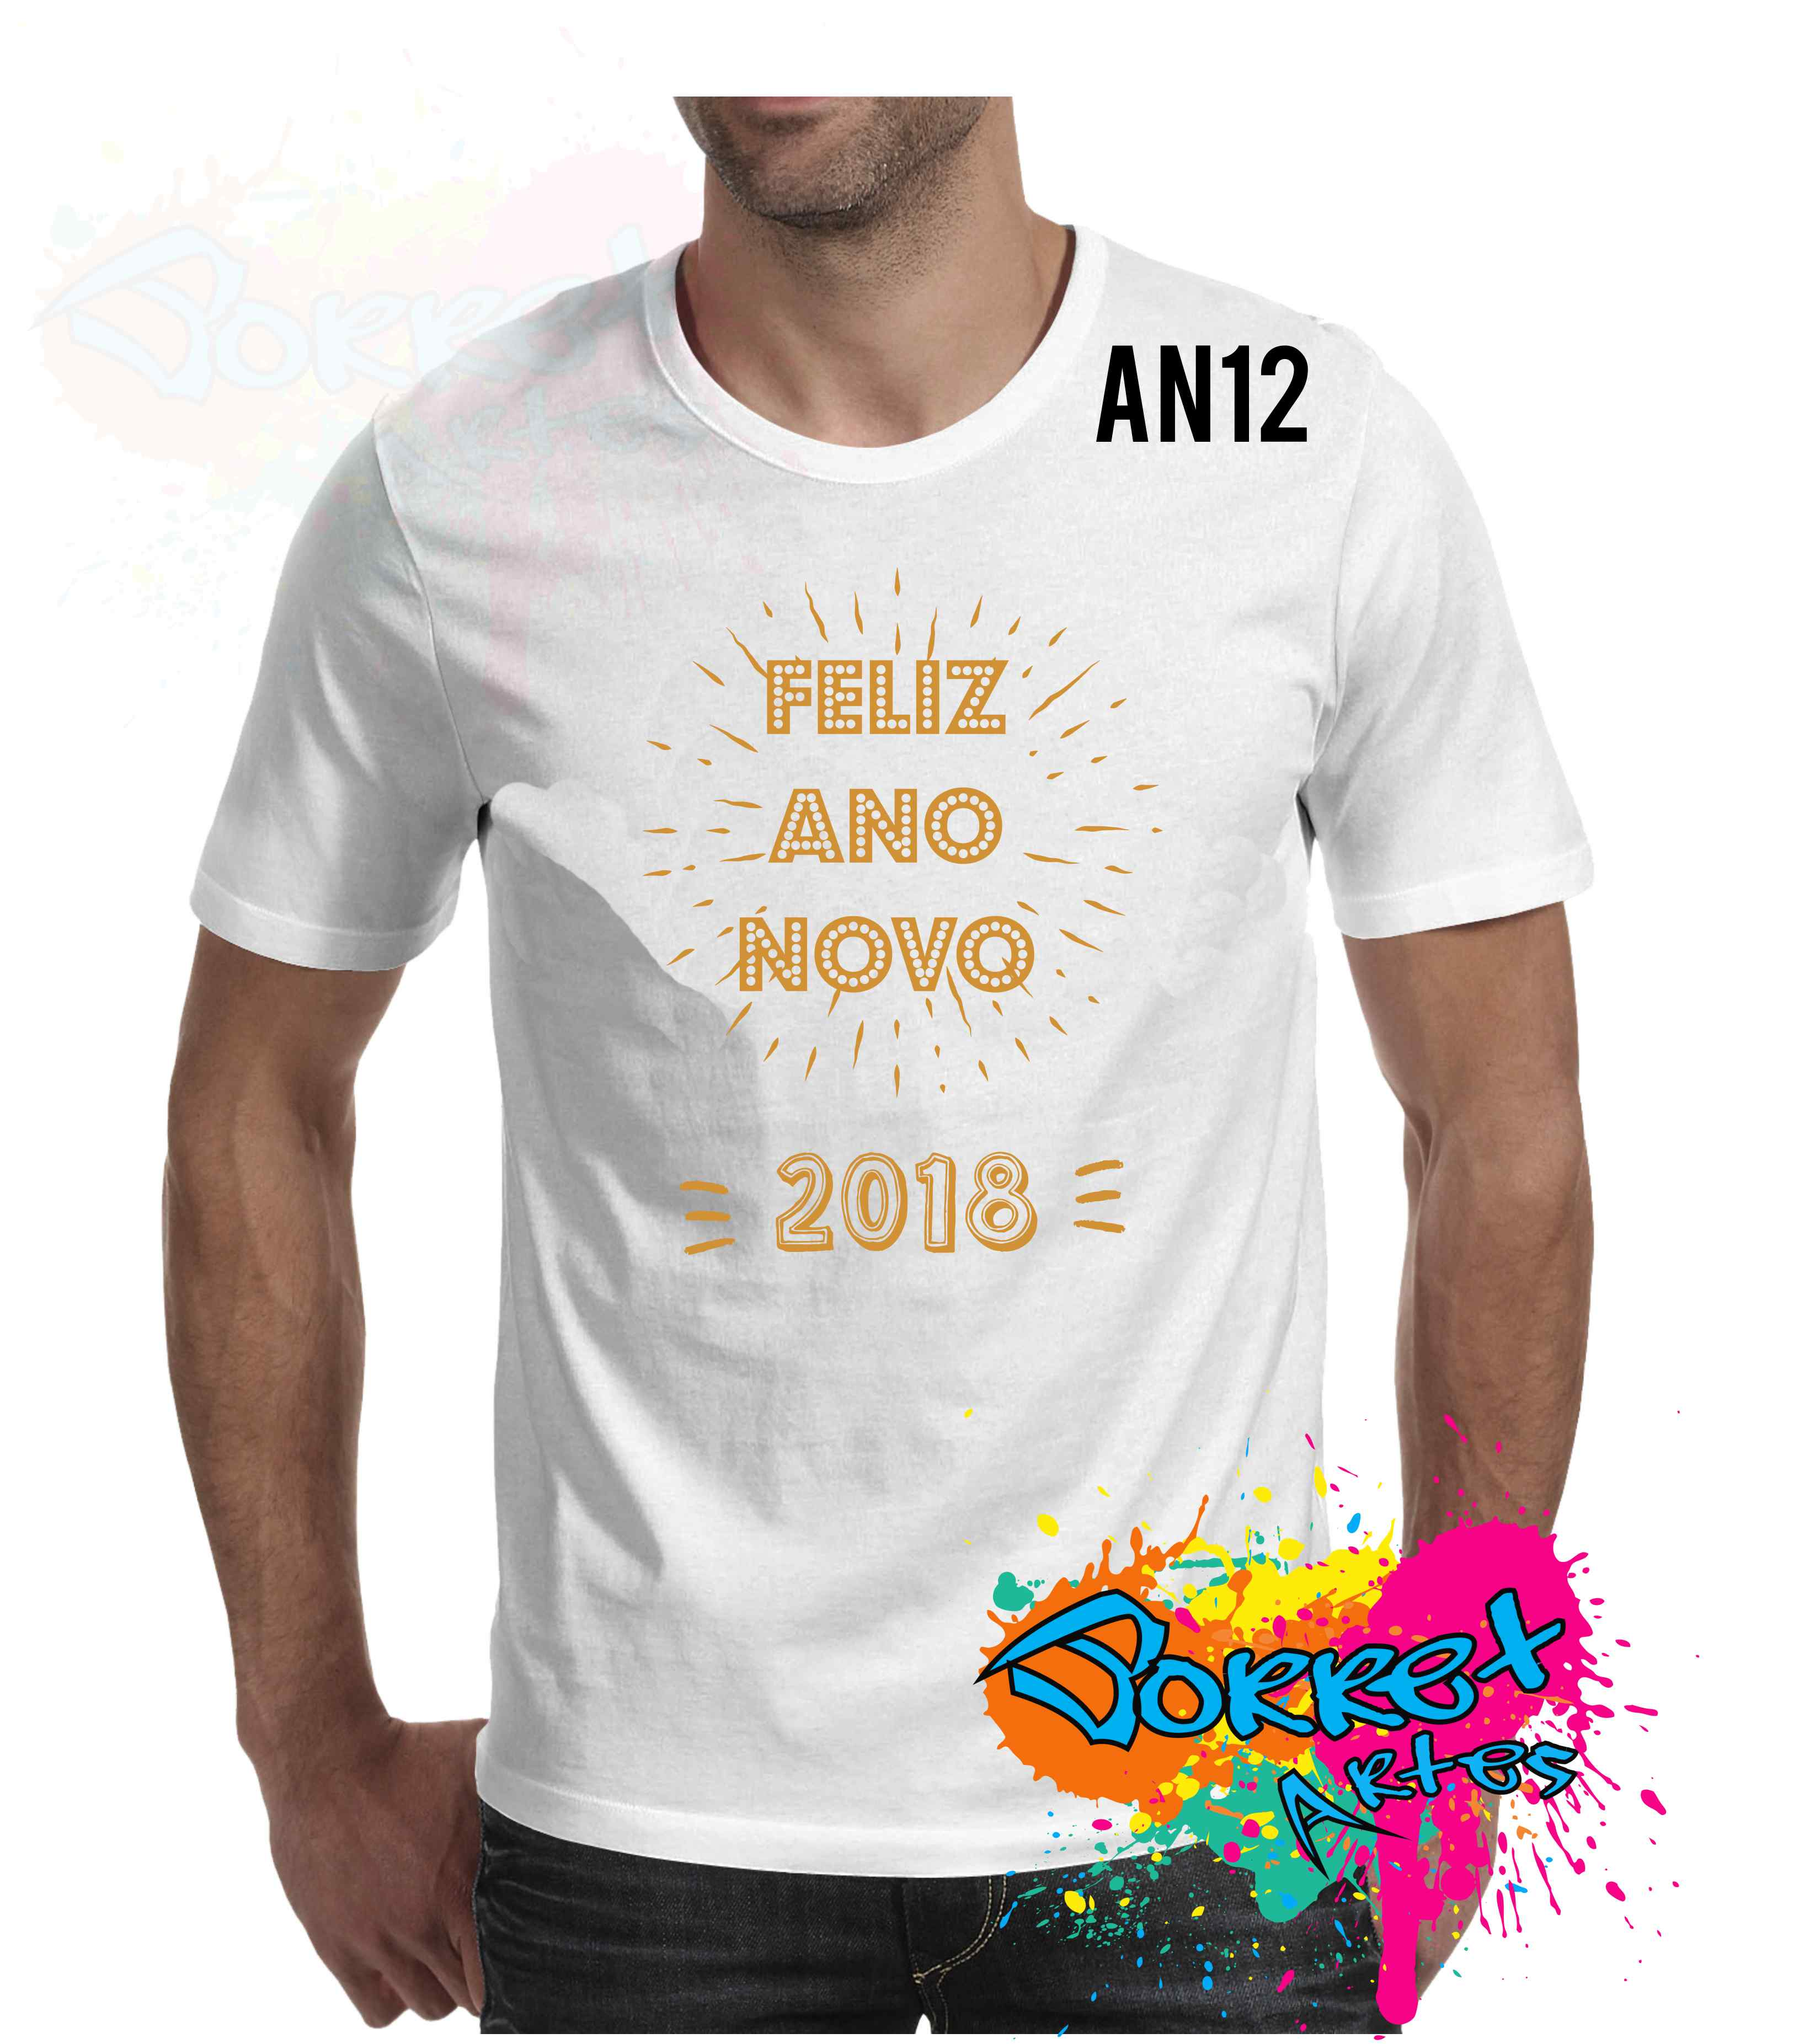 Camisa 2018 Festa  ee9b52eddfe5d